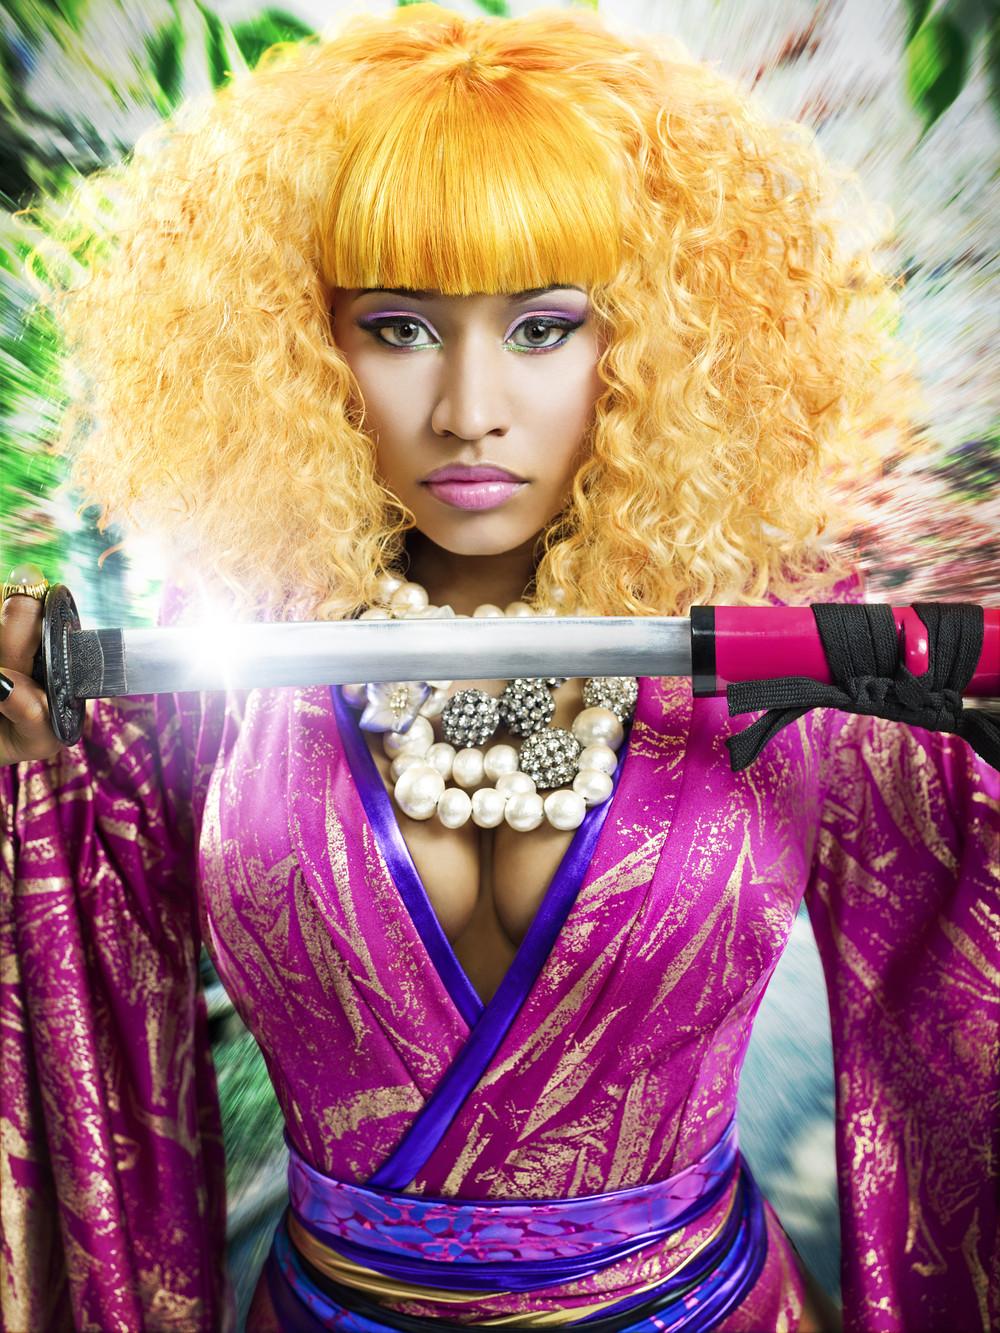 Nicki Minaj's Acapellas To Download For FREE From